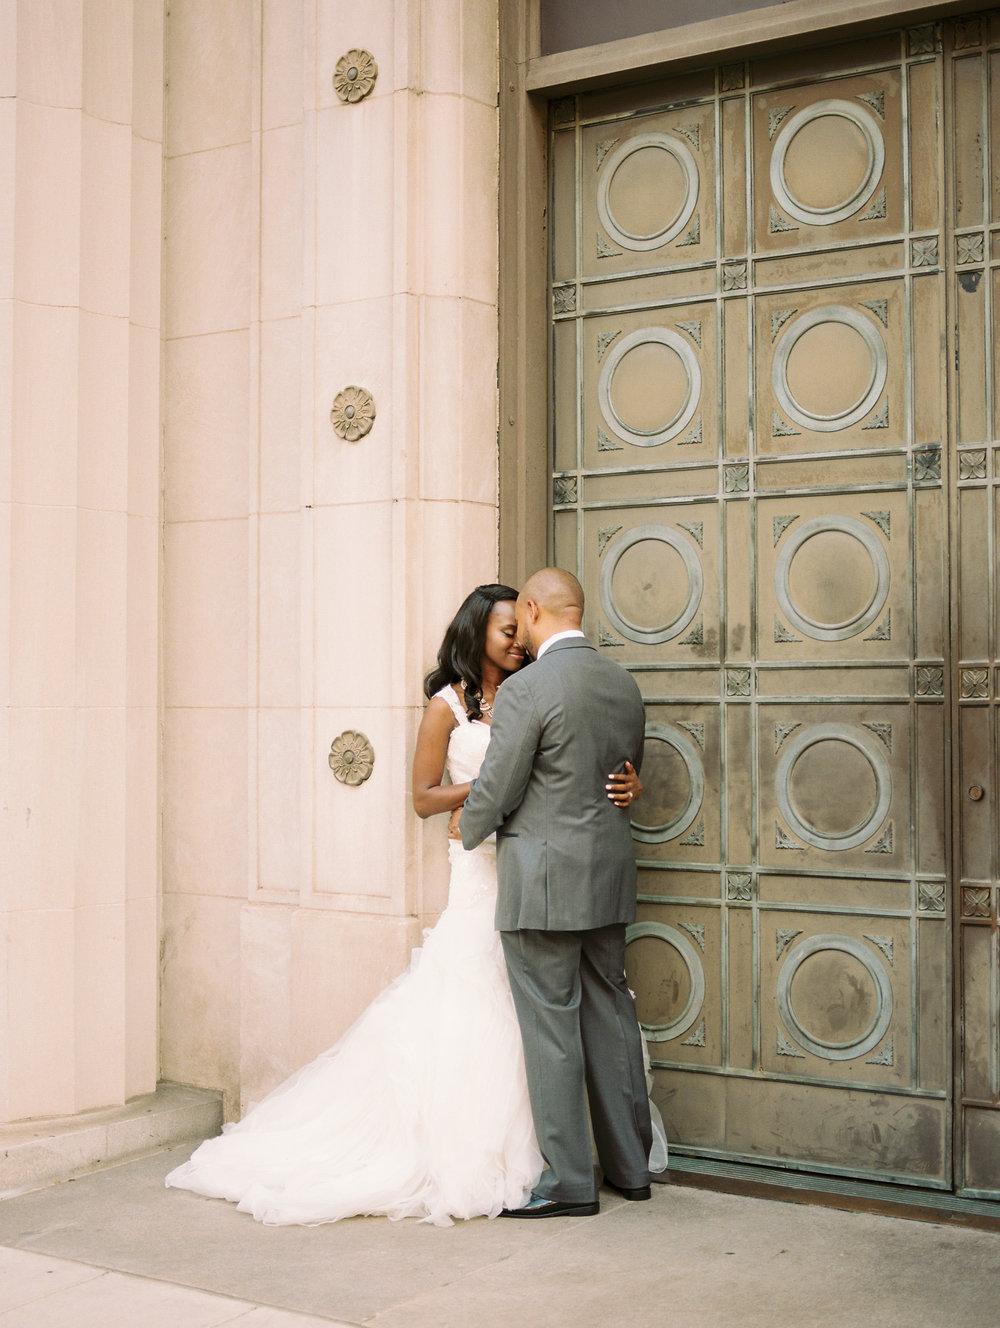 Deanna & Darren - Wedding - © Kaitlyn Stoddard Photography448.jpg